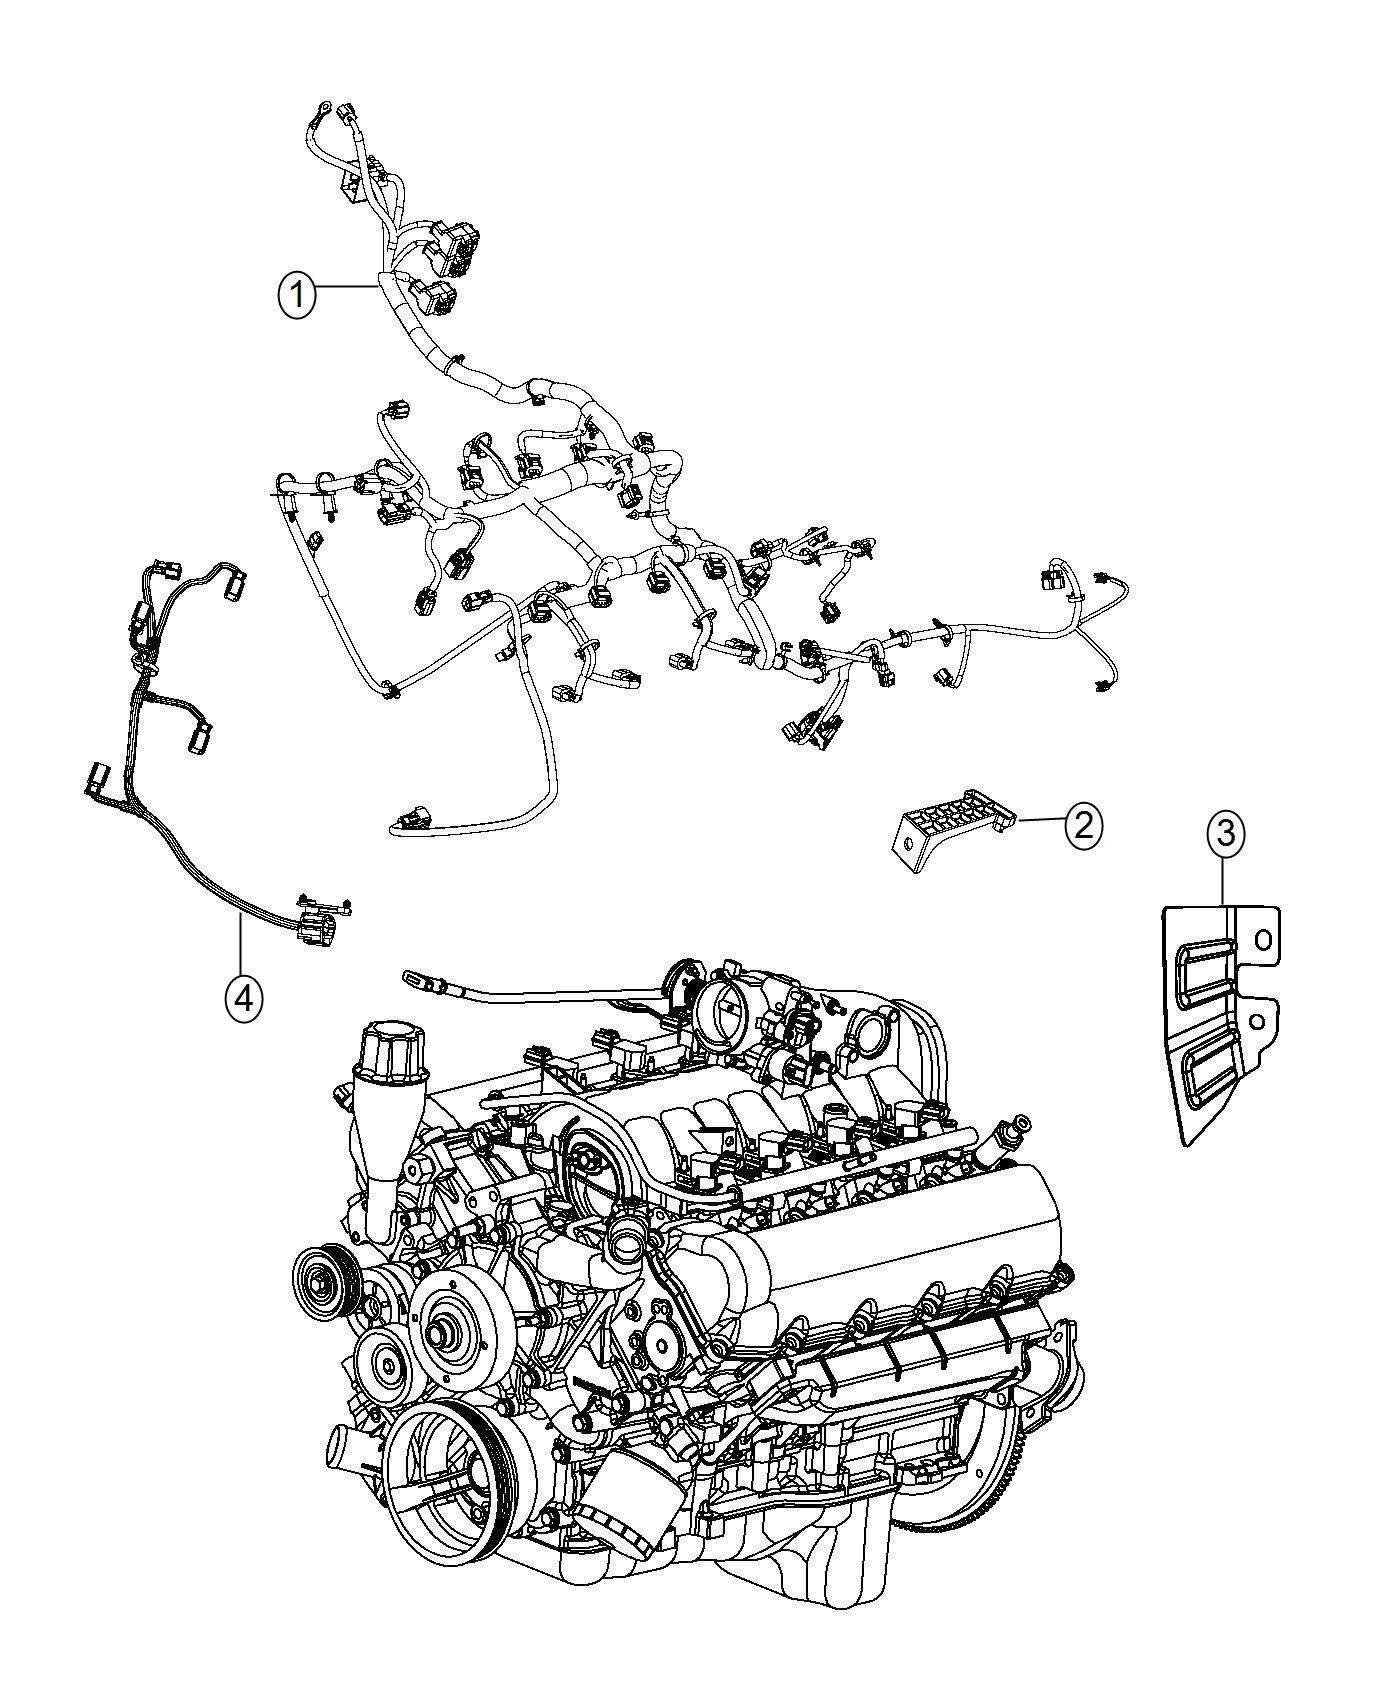 31 Dodge Ram Alternator Wiring Diagram